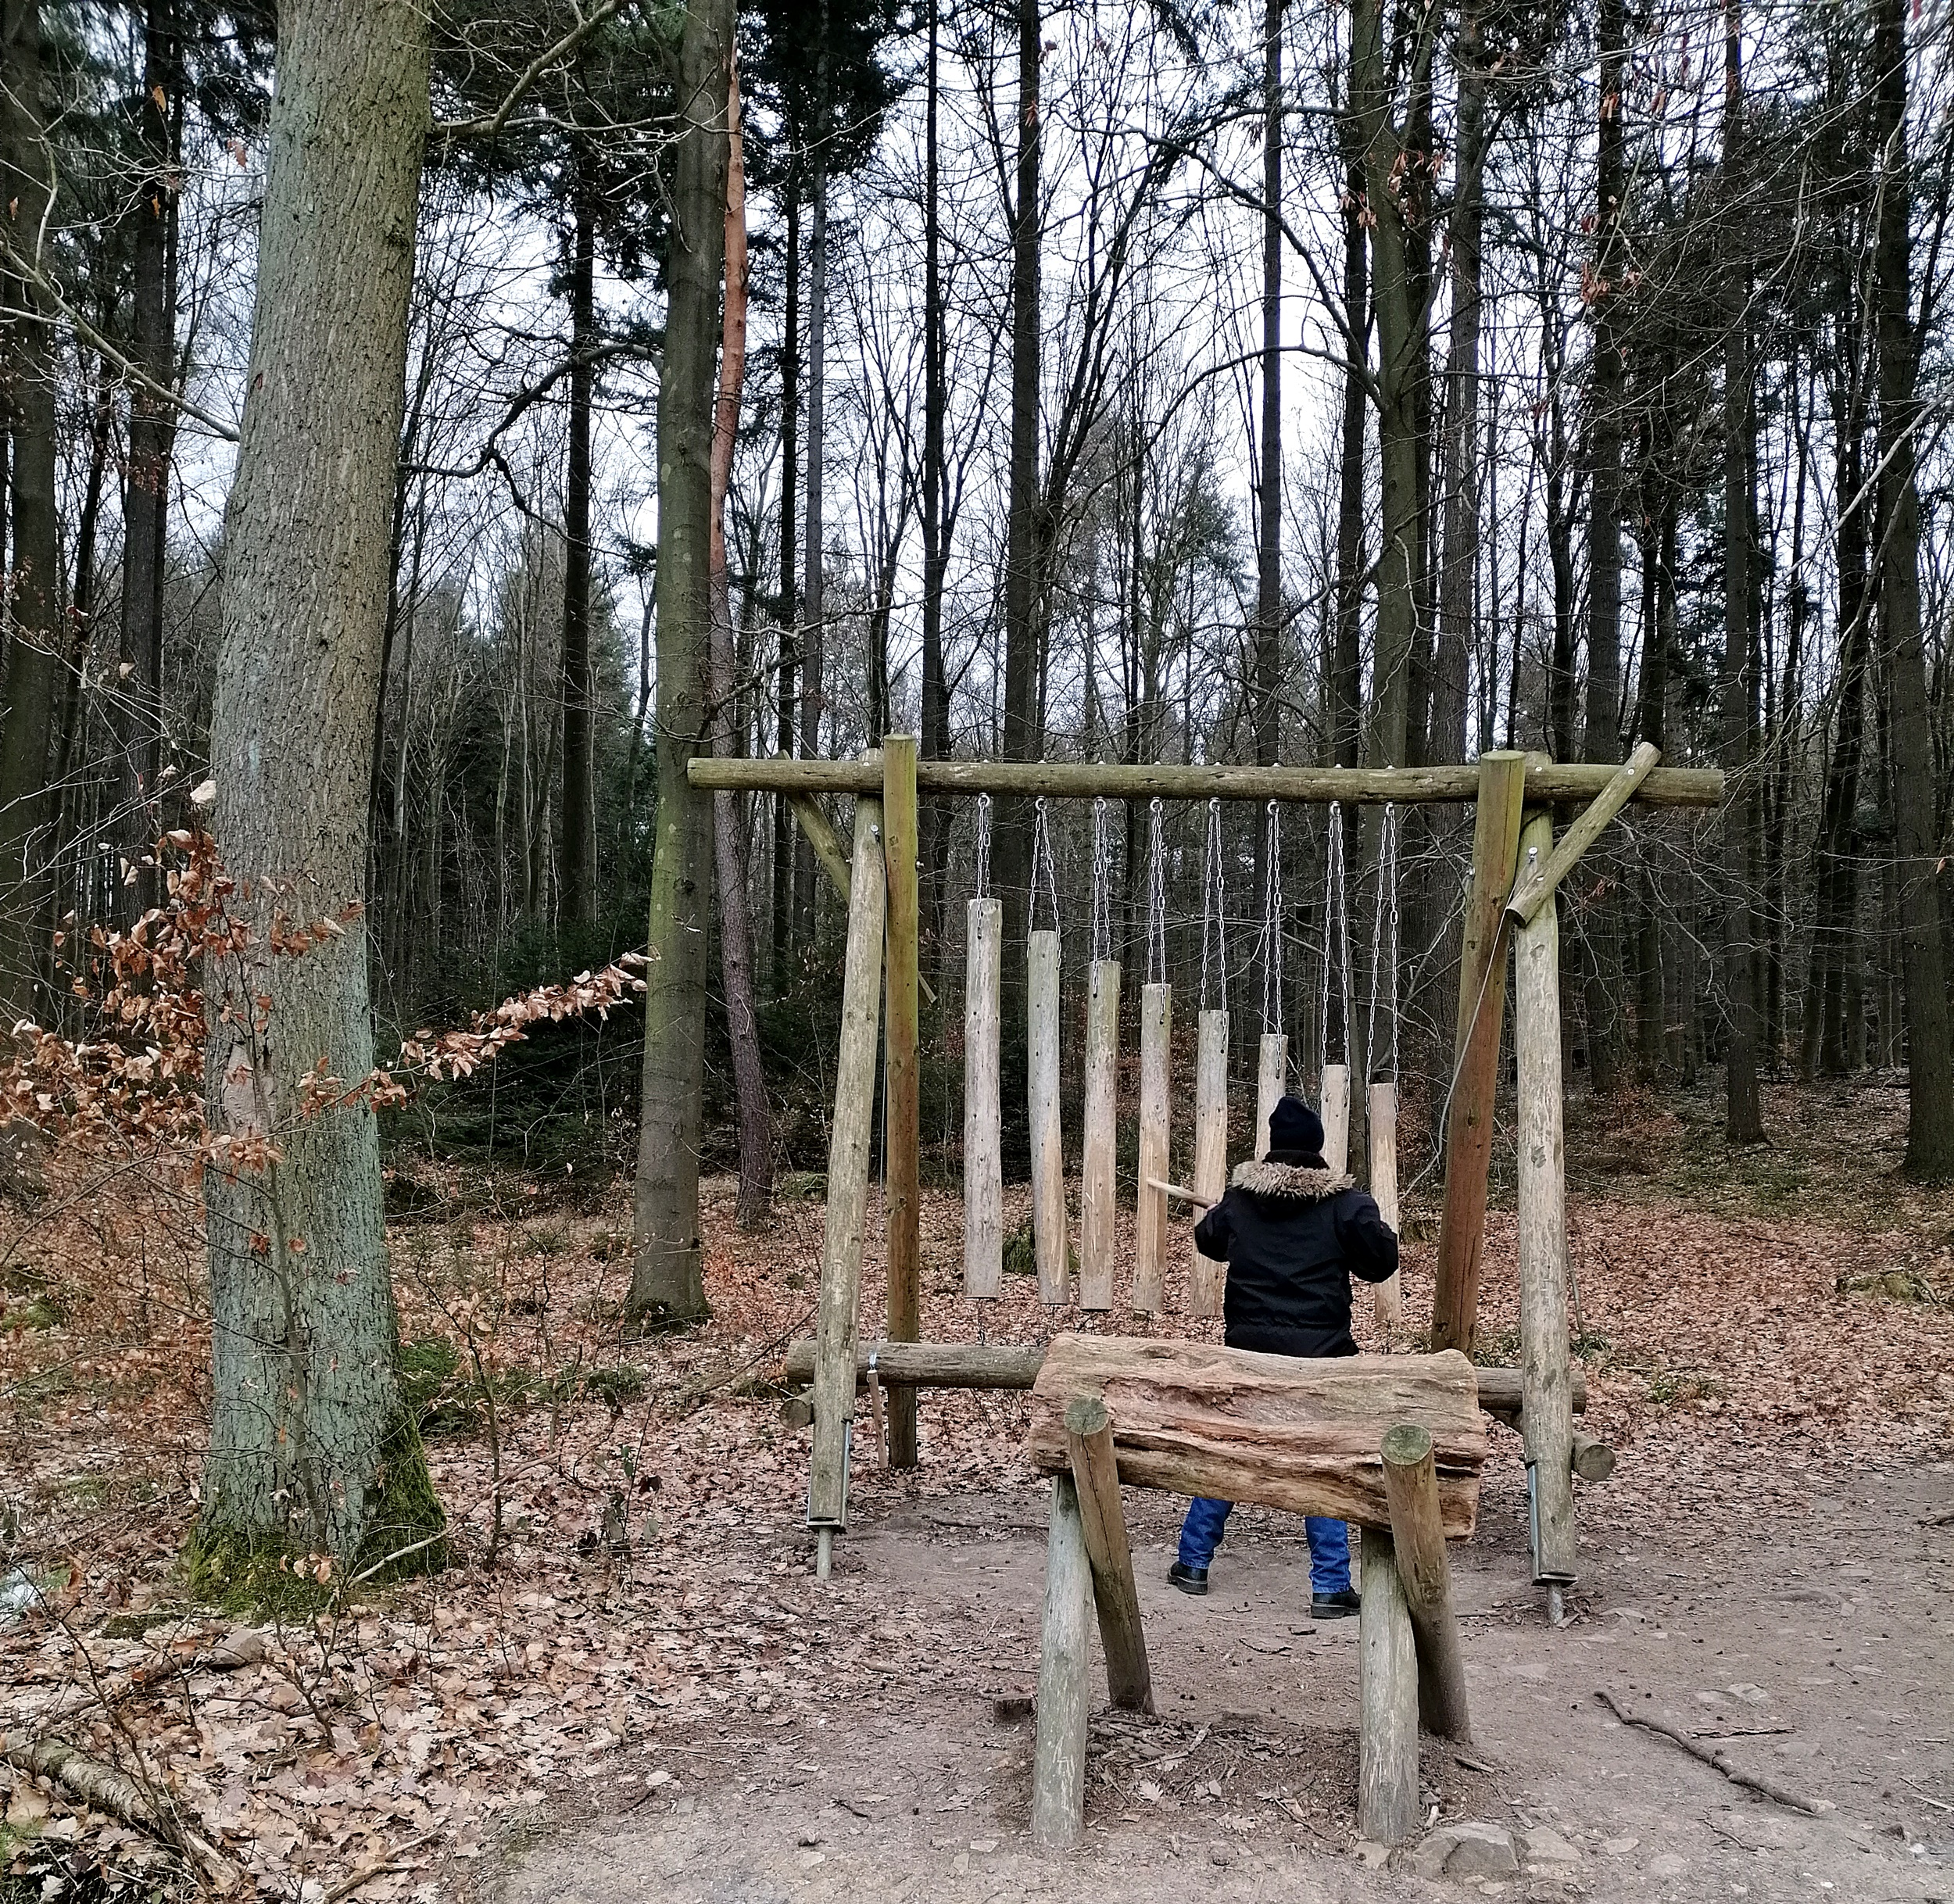 Erlebnispfad Binger Wald